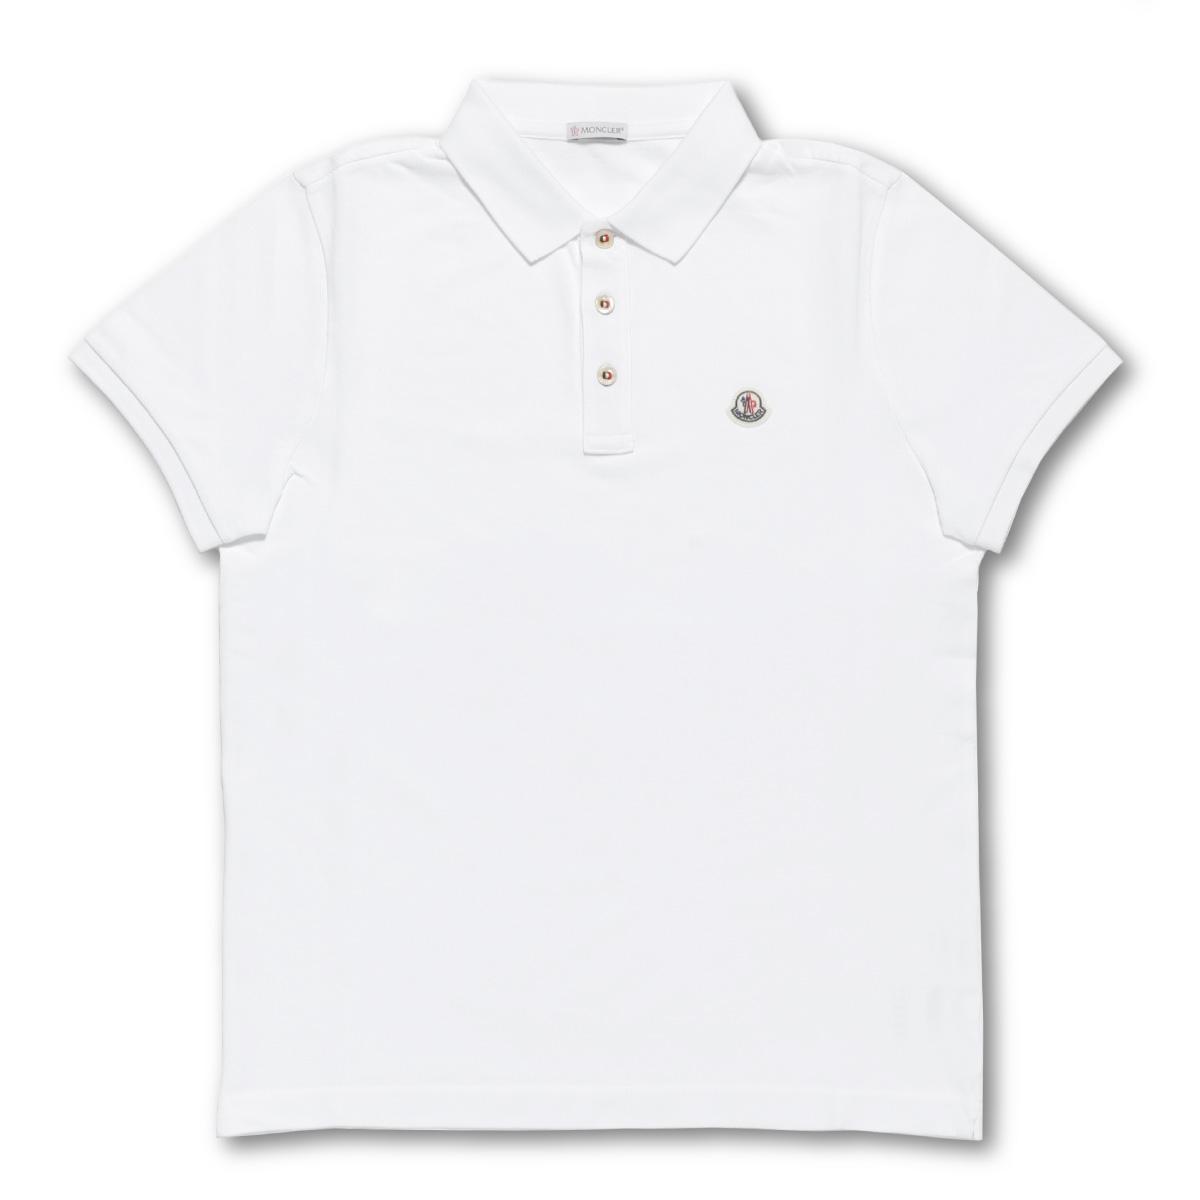 e2b42d6cb21e53 importshopdouble: Monk rail MONCLER polo shirt men 8340800 84556 001  short-sleeved polo shirt WHITE white | Rakuten Global Market